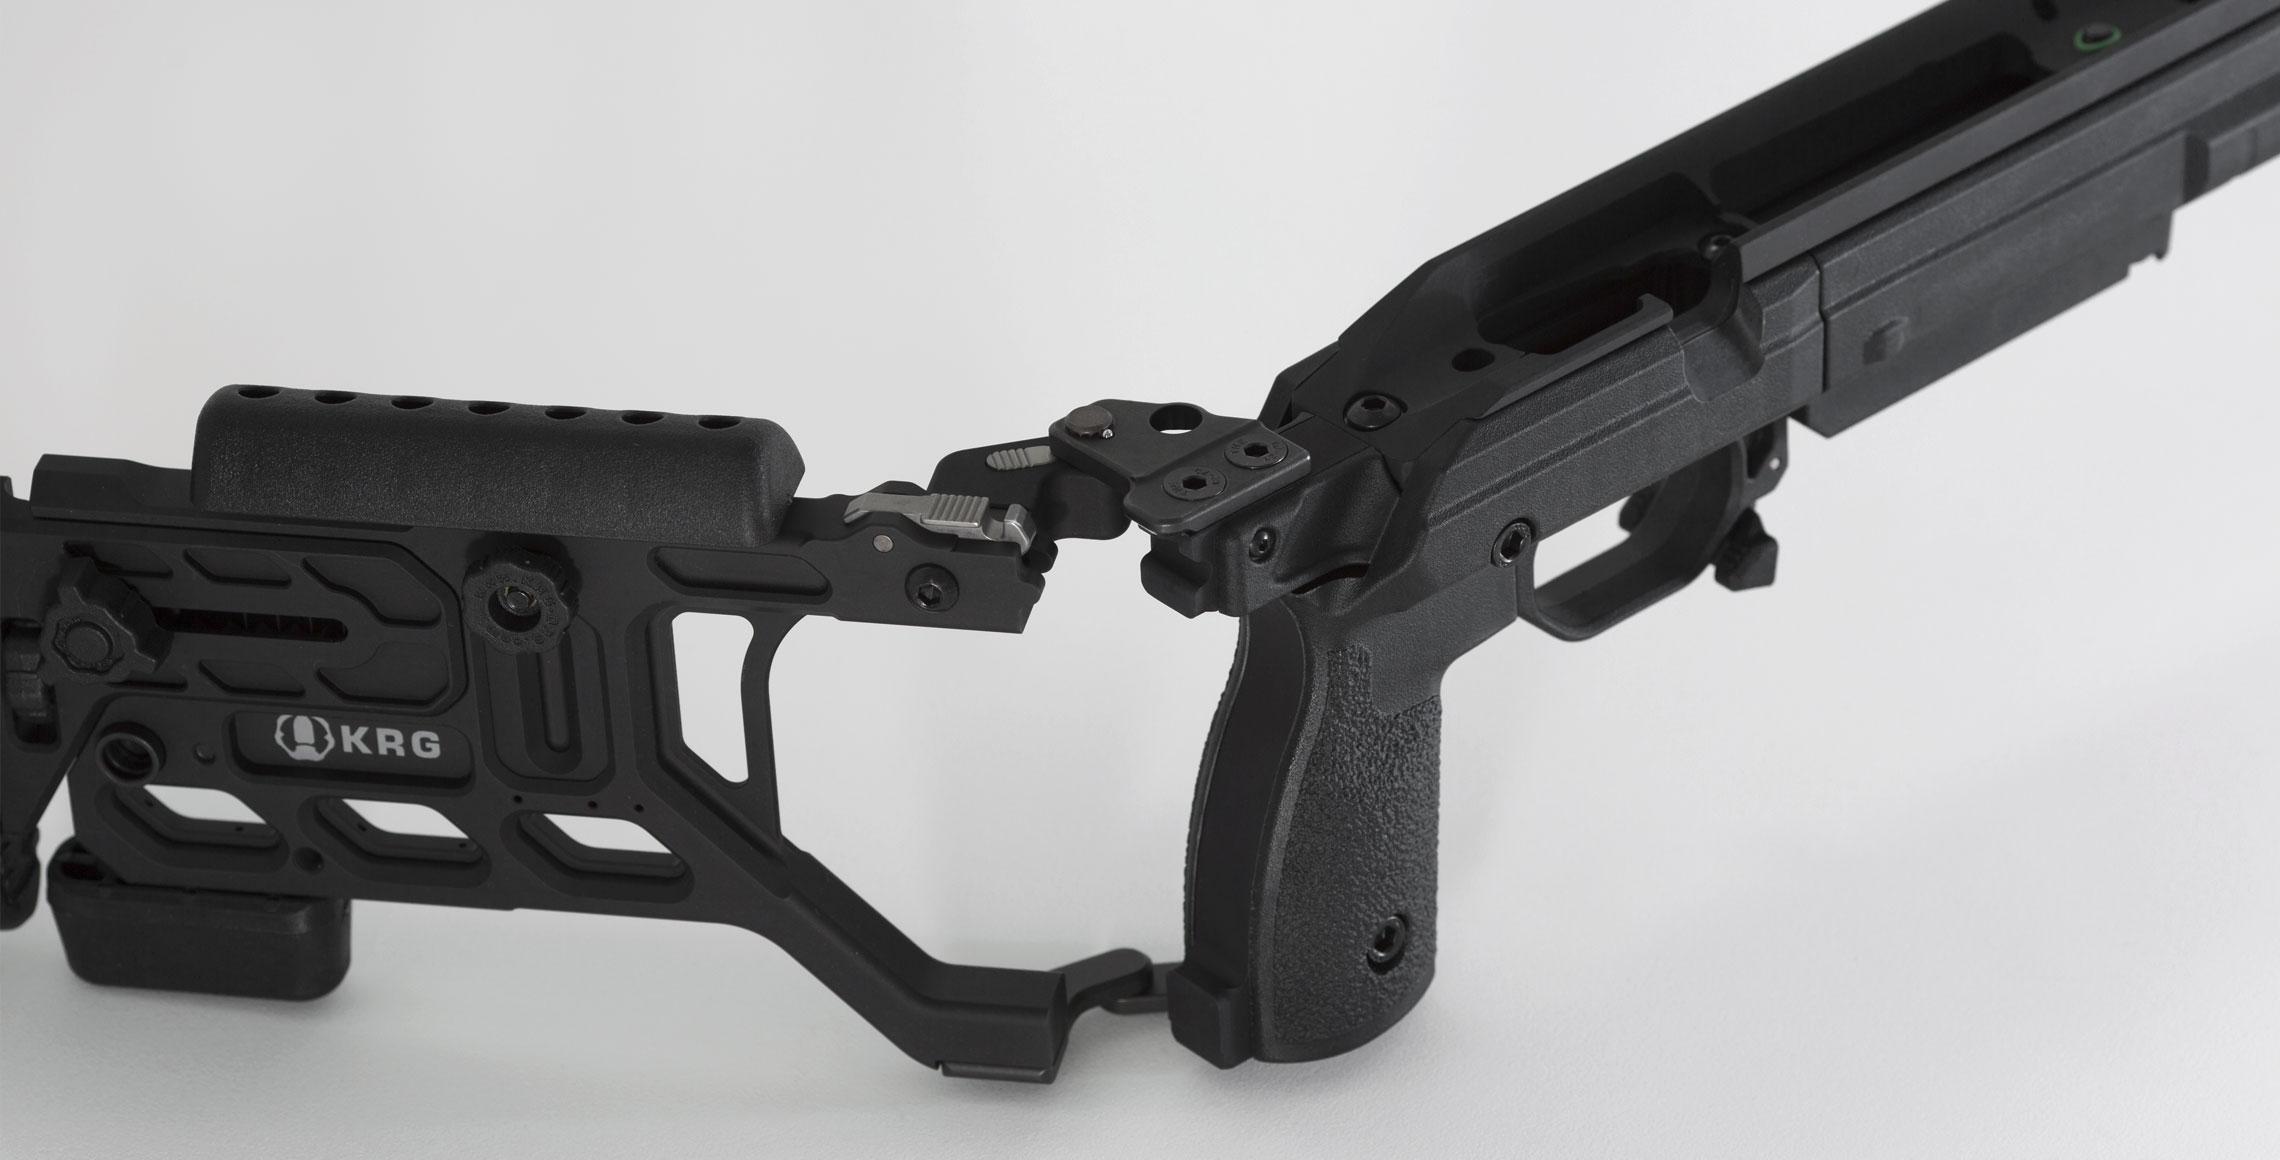 Tikka T3 Tactical Stock, Modular & Precision Rifle Chassis ...